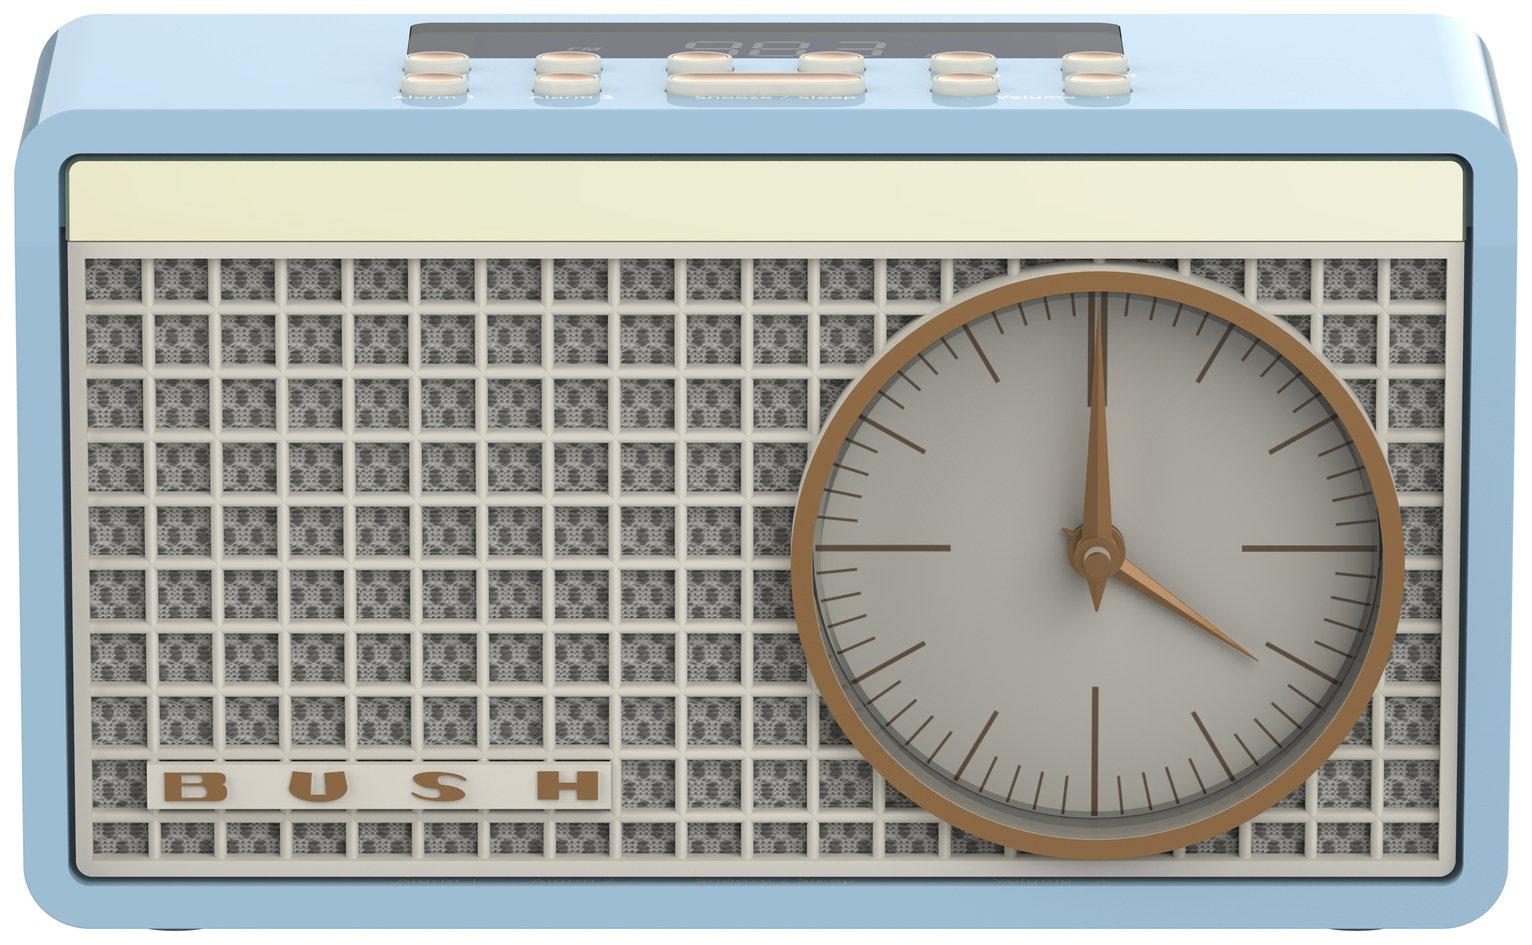 Bush Classic Retro Analogue Clock Radio - Duck Egg